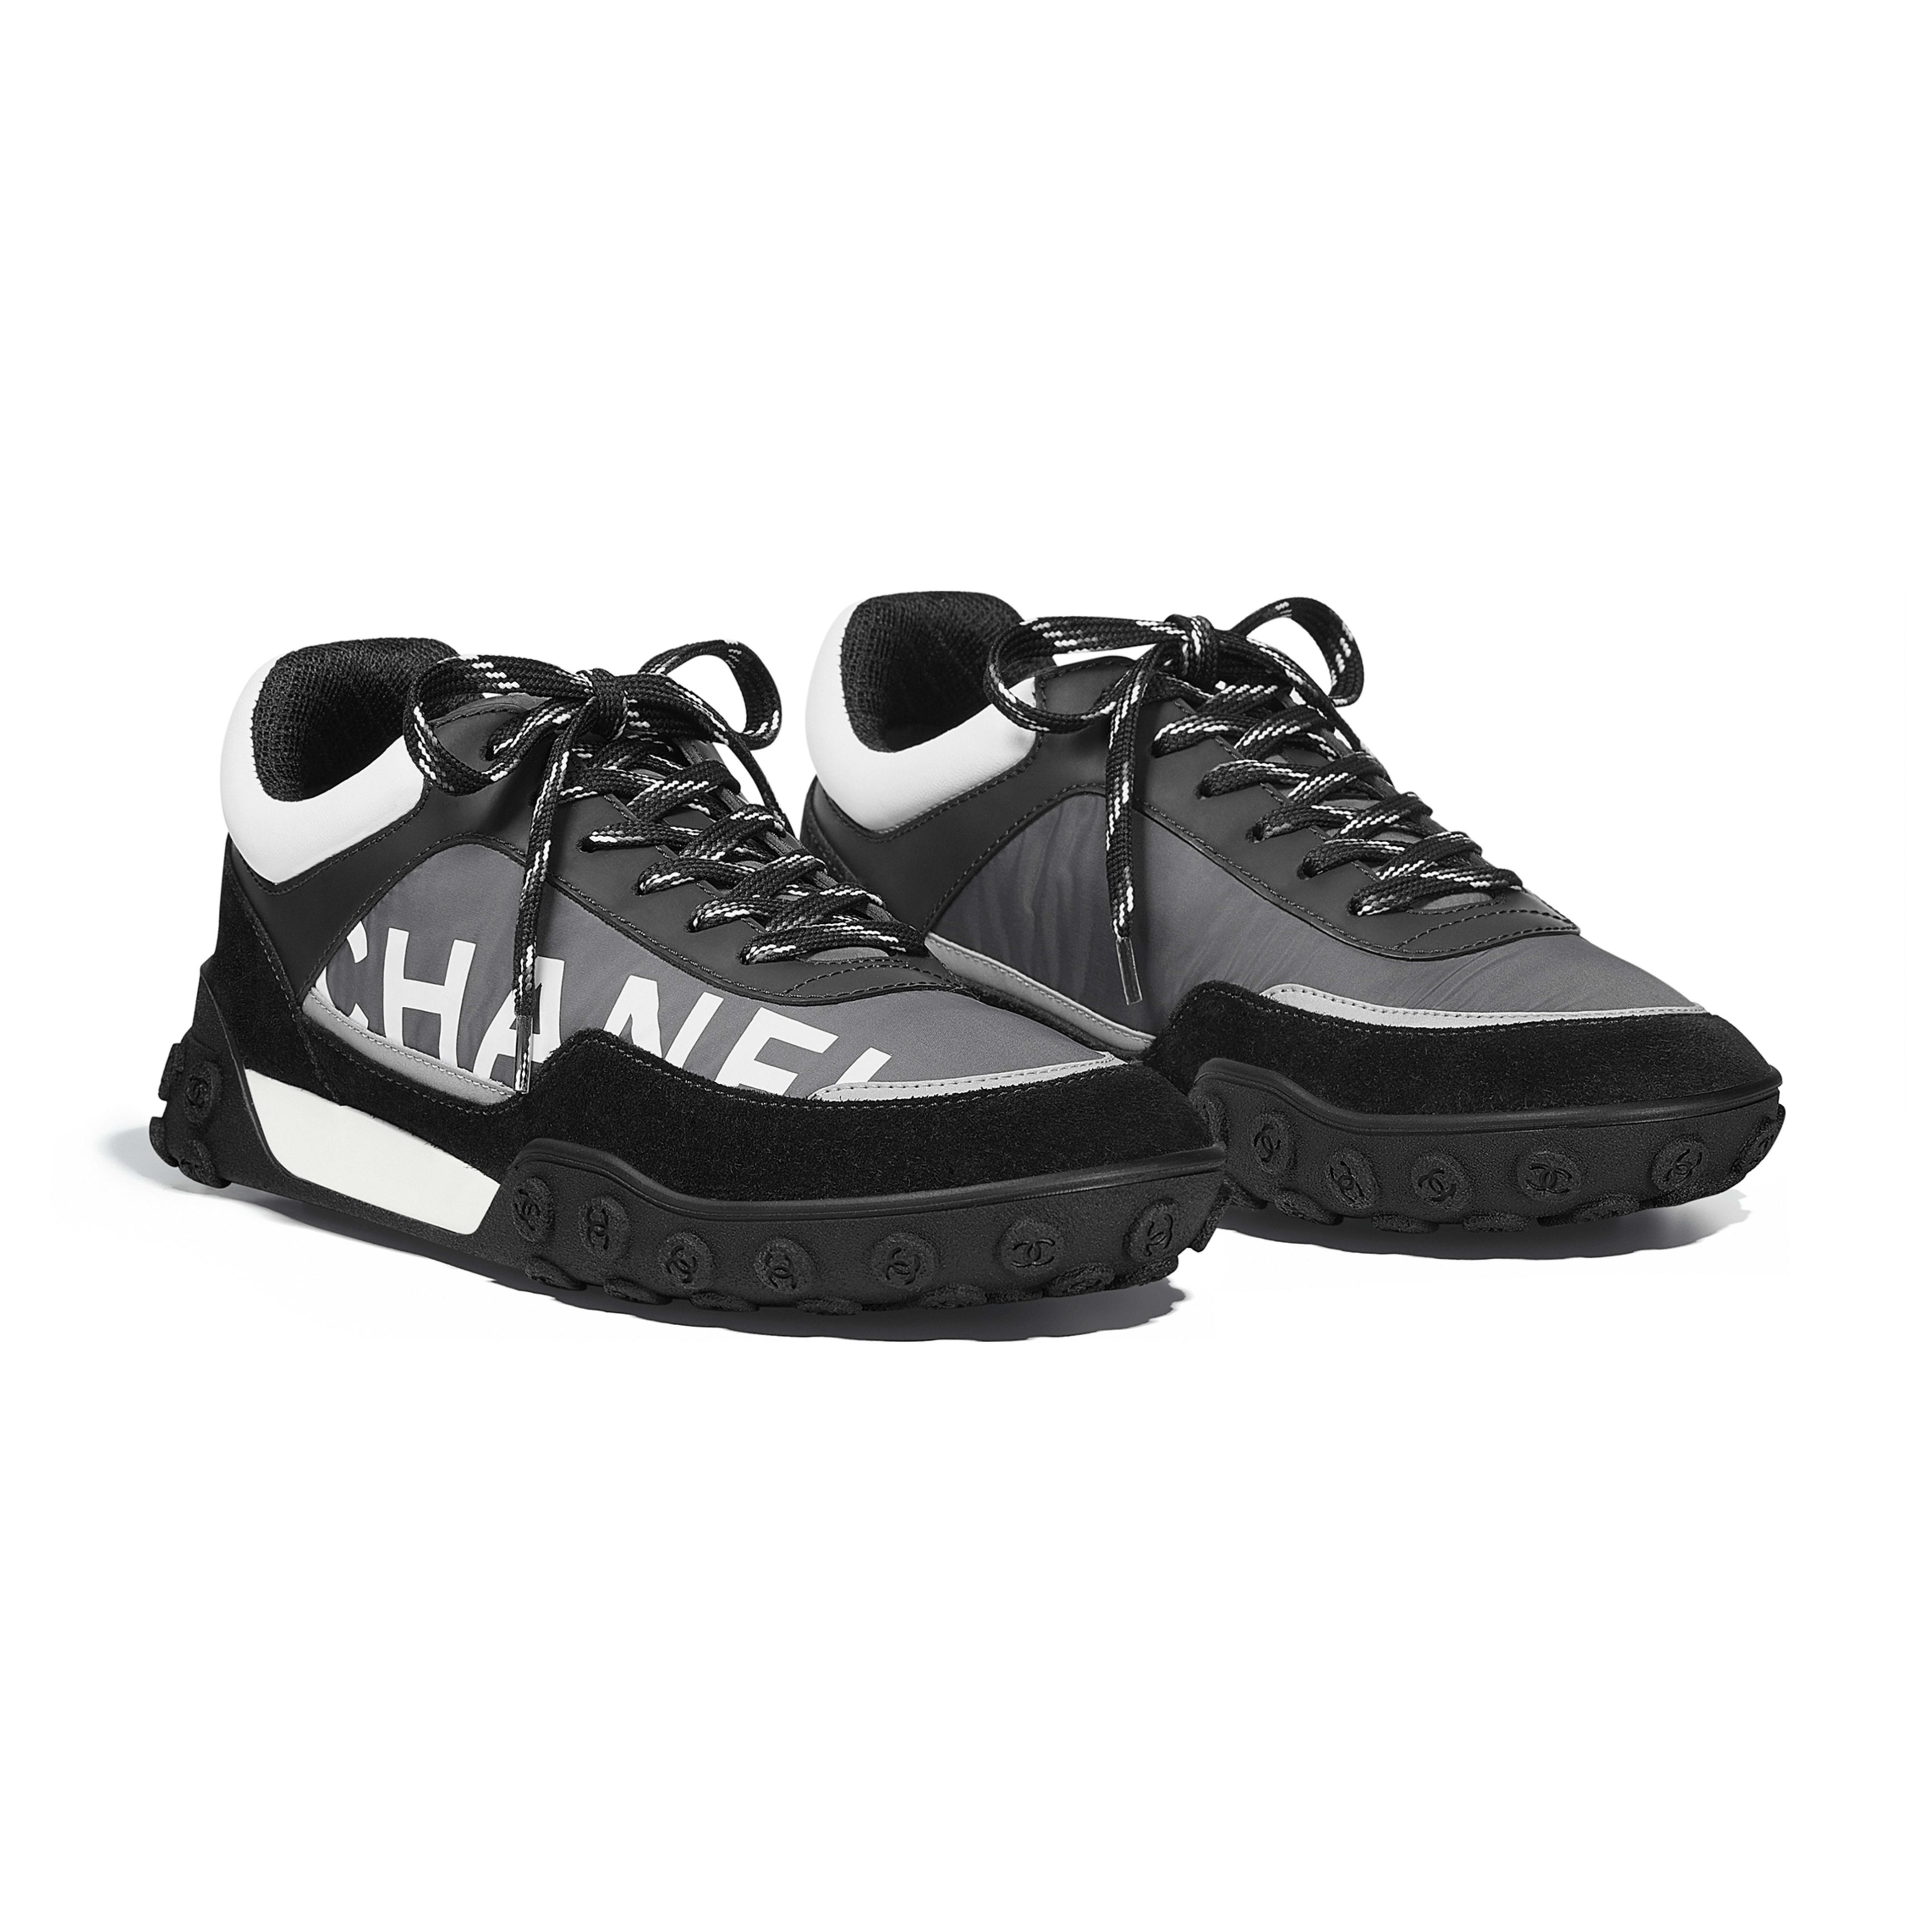 Sneakers - Gray, Black & White - Nylon & Calfskin - Alternative view - see full sized version